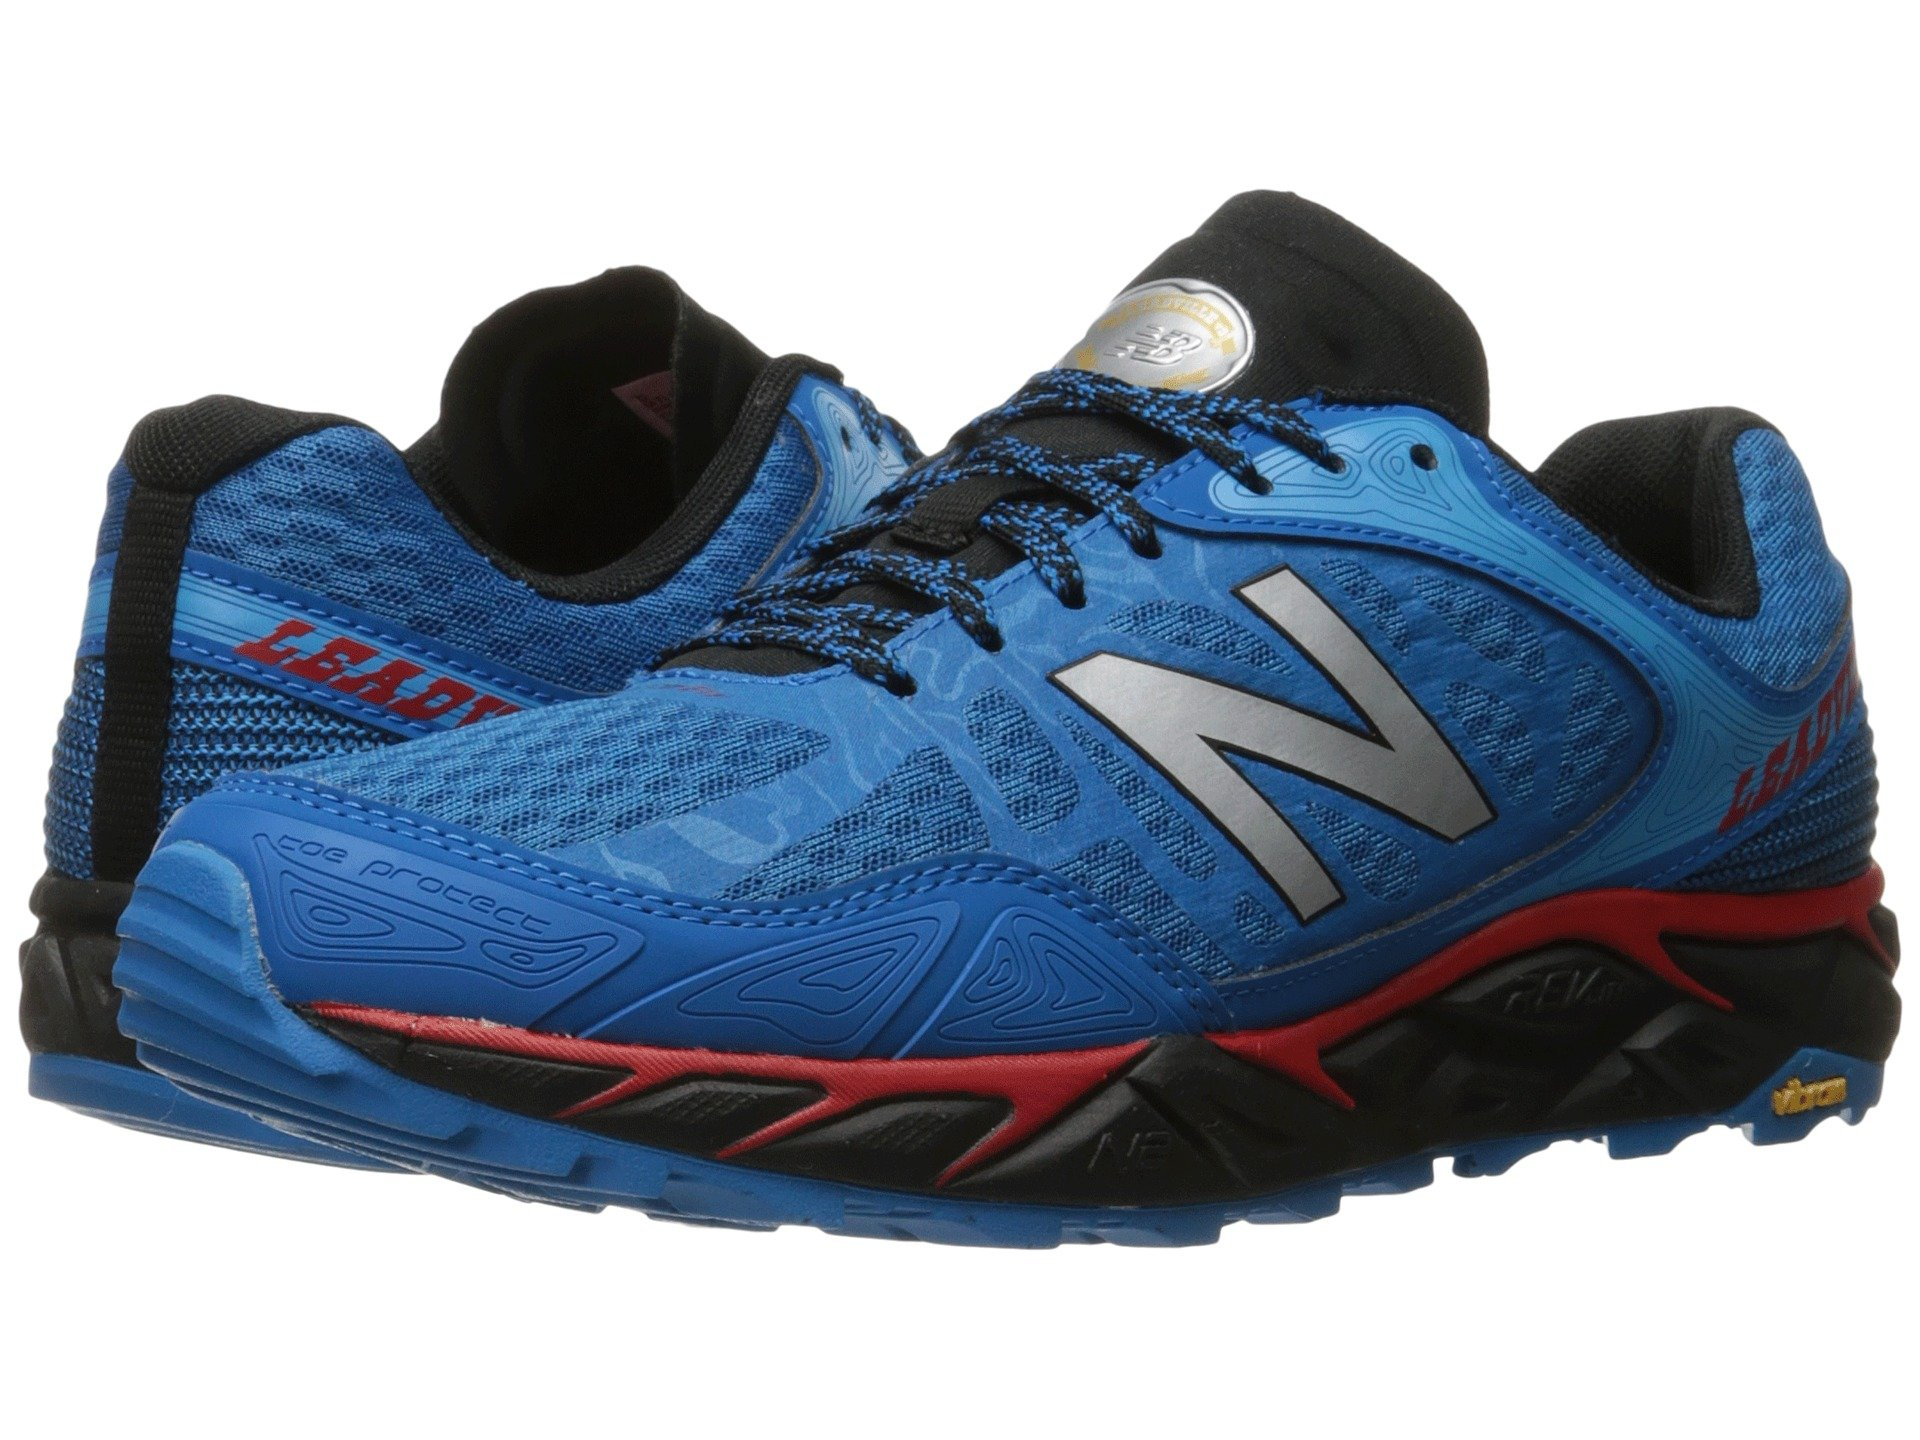 New Balance Leadville V Men S Shoes Blue Black